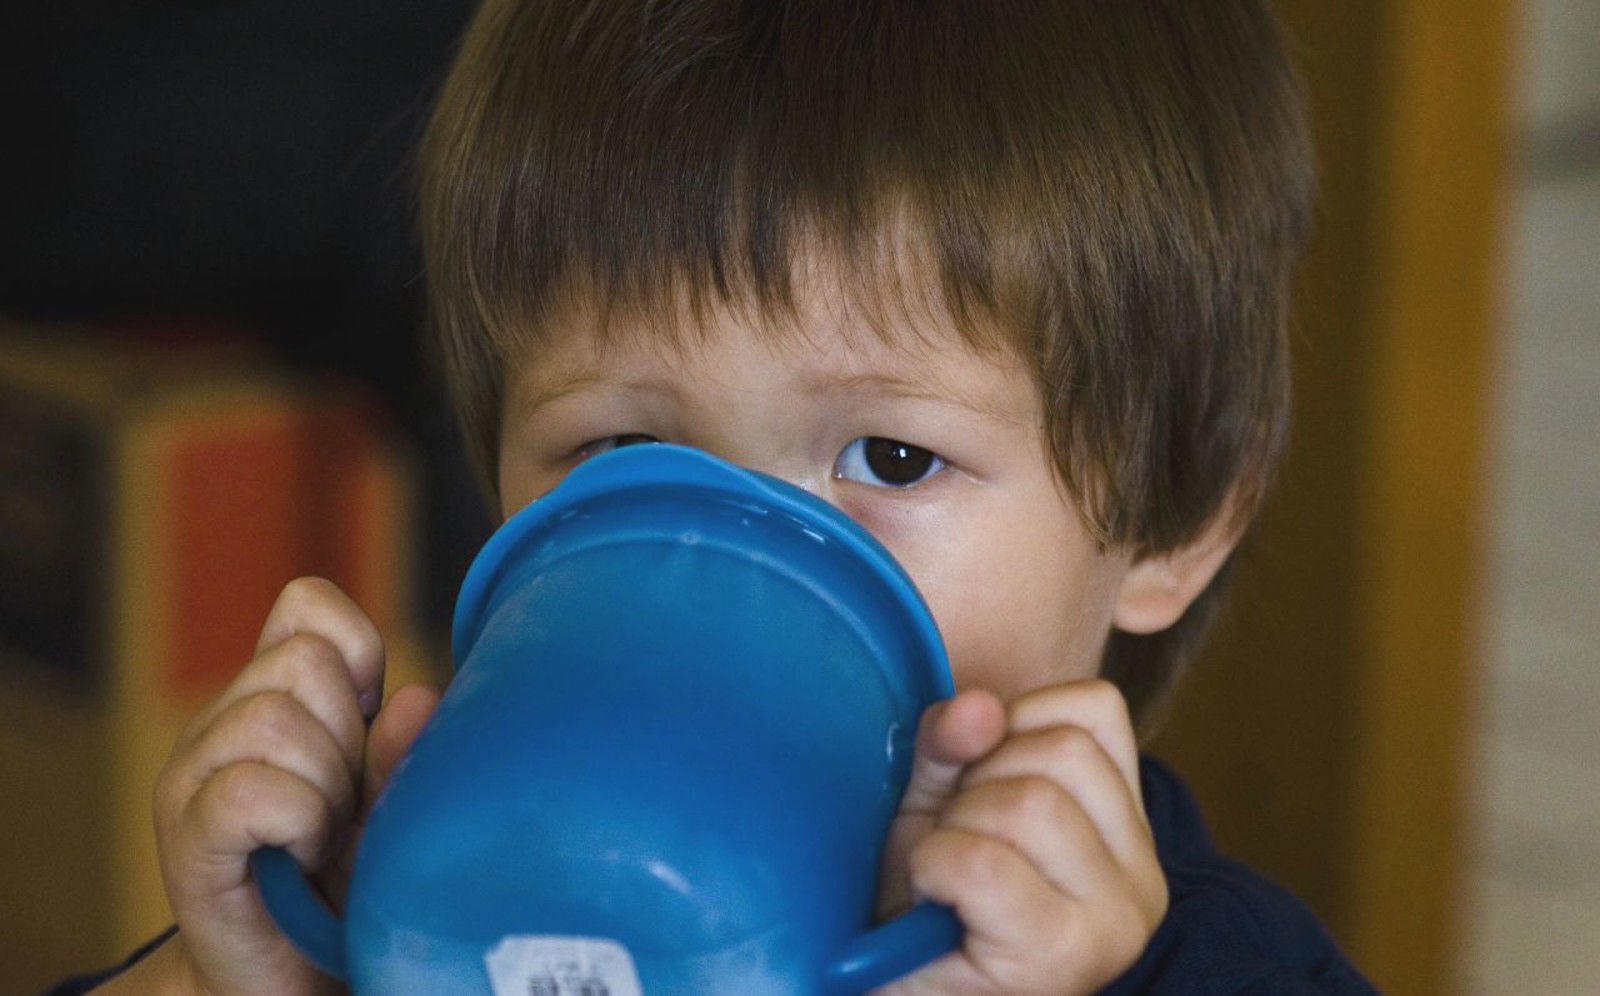 4 Reasons Why BPA-Free Plastics Can Still Harm Your Health